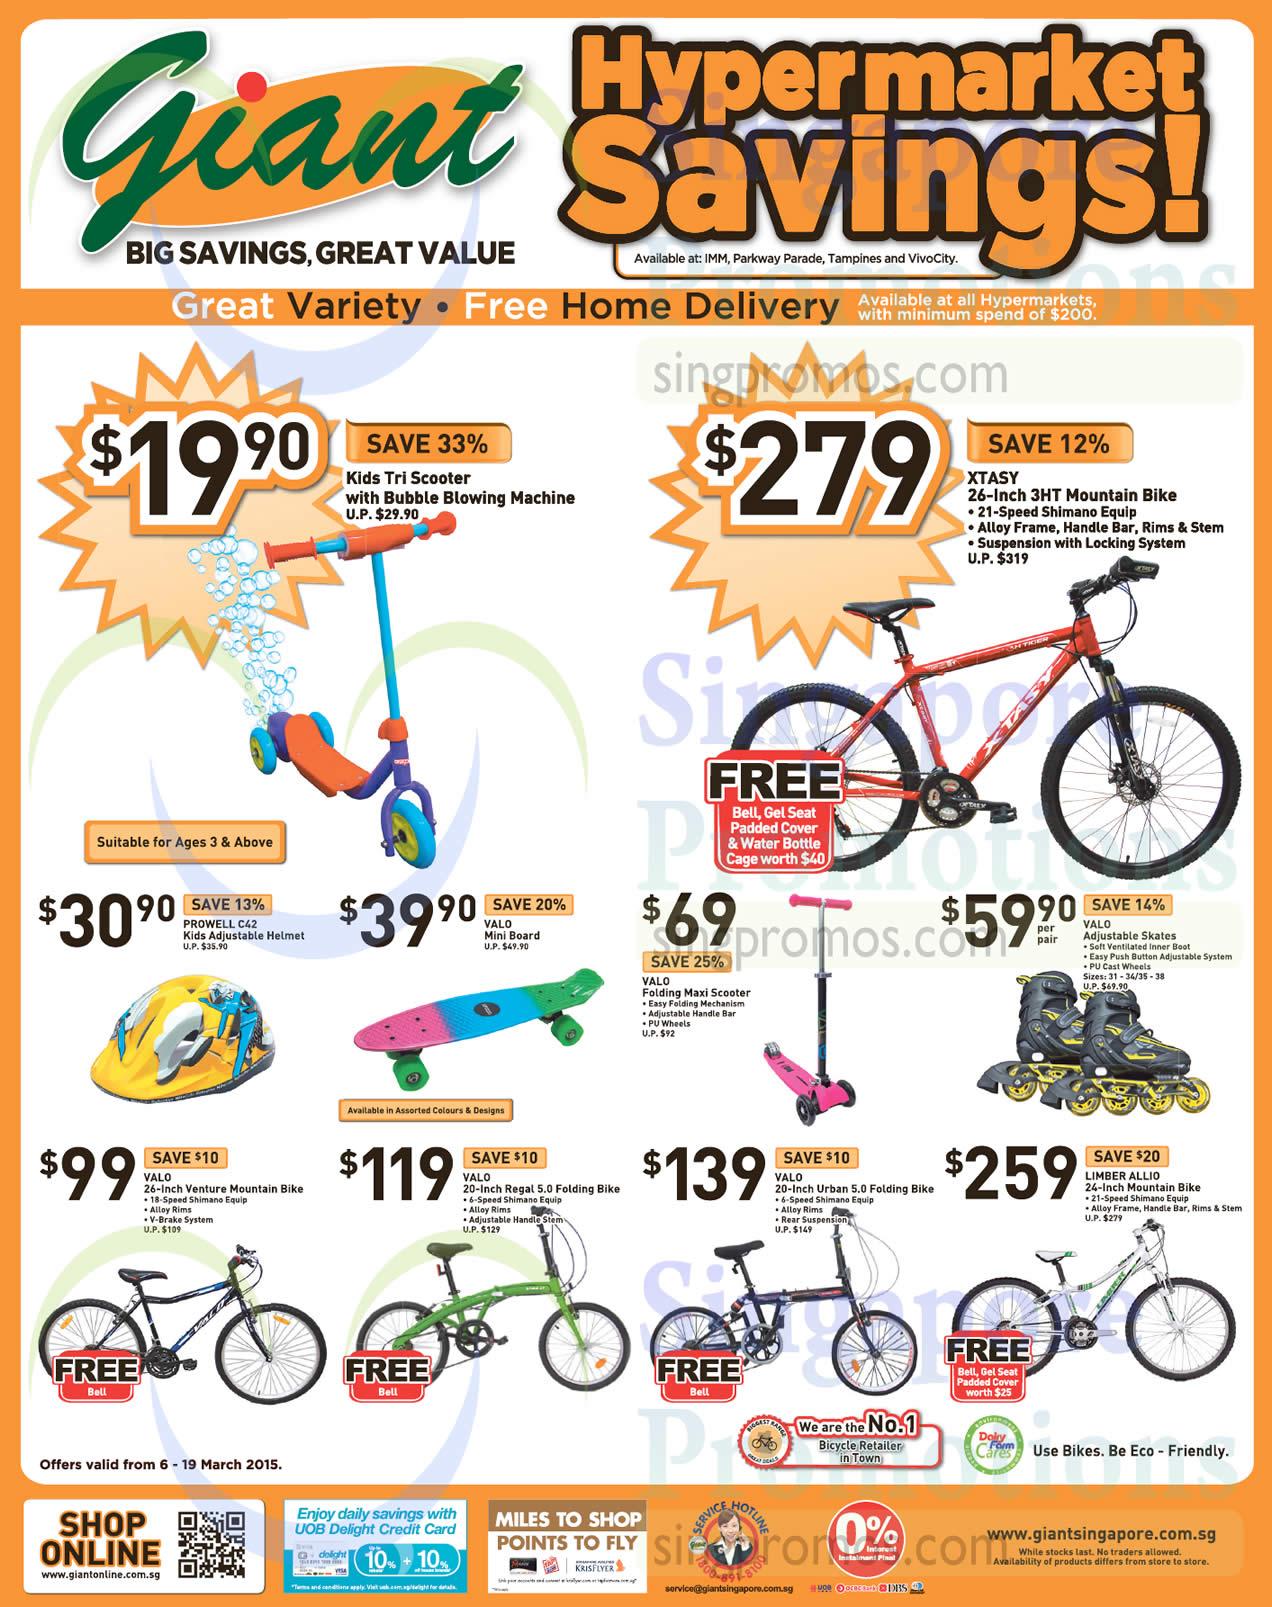 XTASY 26-Inch 3HT Mountain Bike, Prowell C42 Kids Adjustable Helmet, Valo Mini Board, Valo Folding Maxi Scooter, Valo Adjustable Skates, Valo 26-Inch Venture Mountain Bike, Valo 20-Inch Regal 5.0 Folding Bike, Valo 20-Inch Urban 5.0 Folding Bike, Limber Allio 24-Inch Mountain Bike